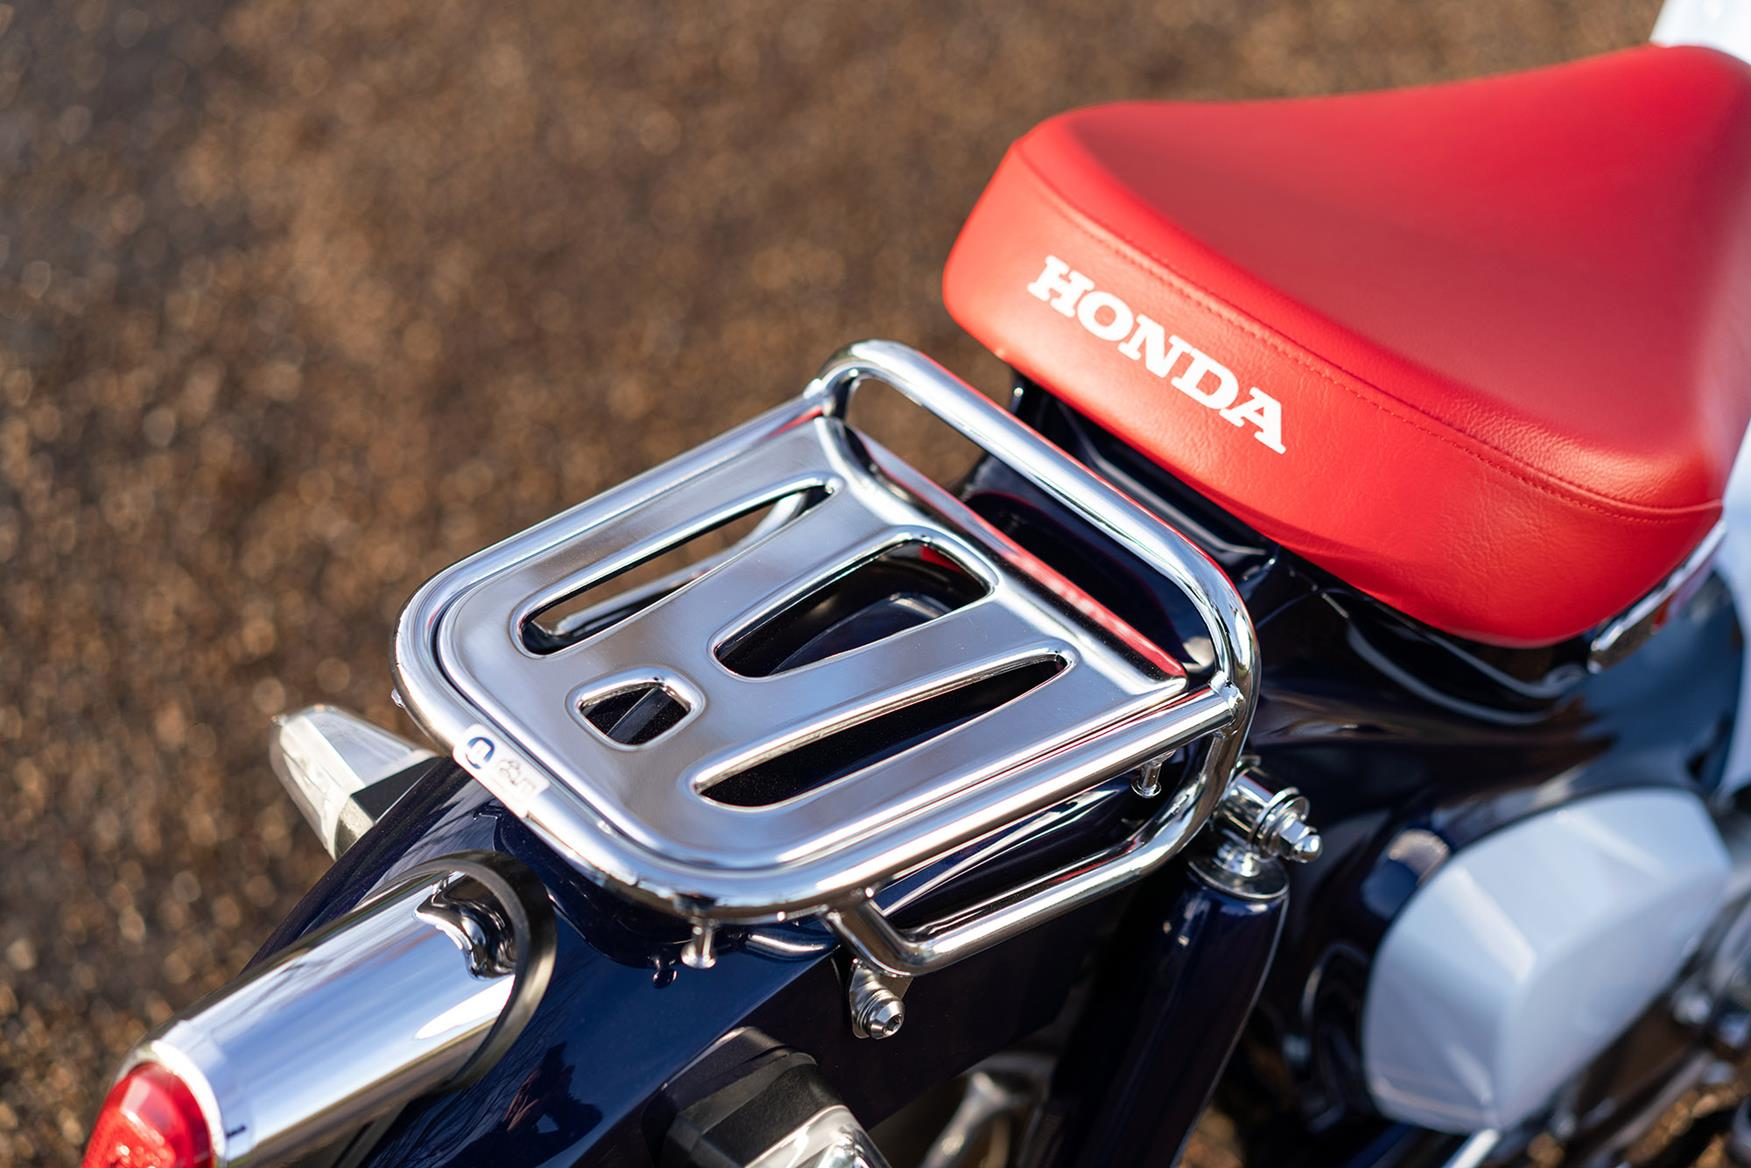 2019 Honda Super Cub Review - YouTube